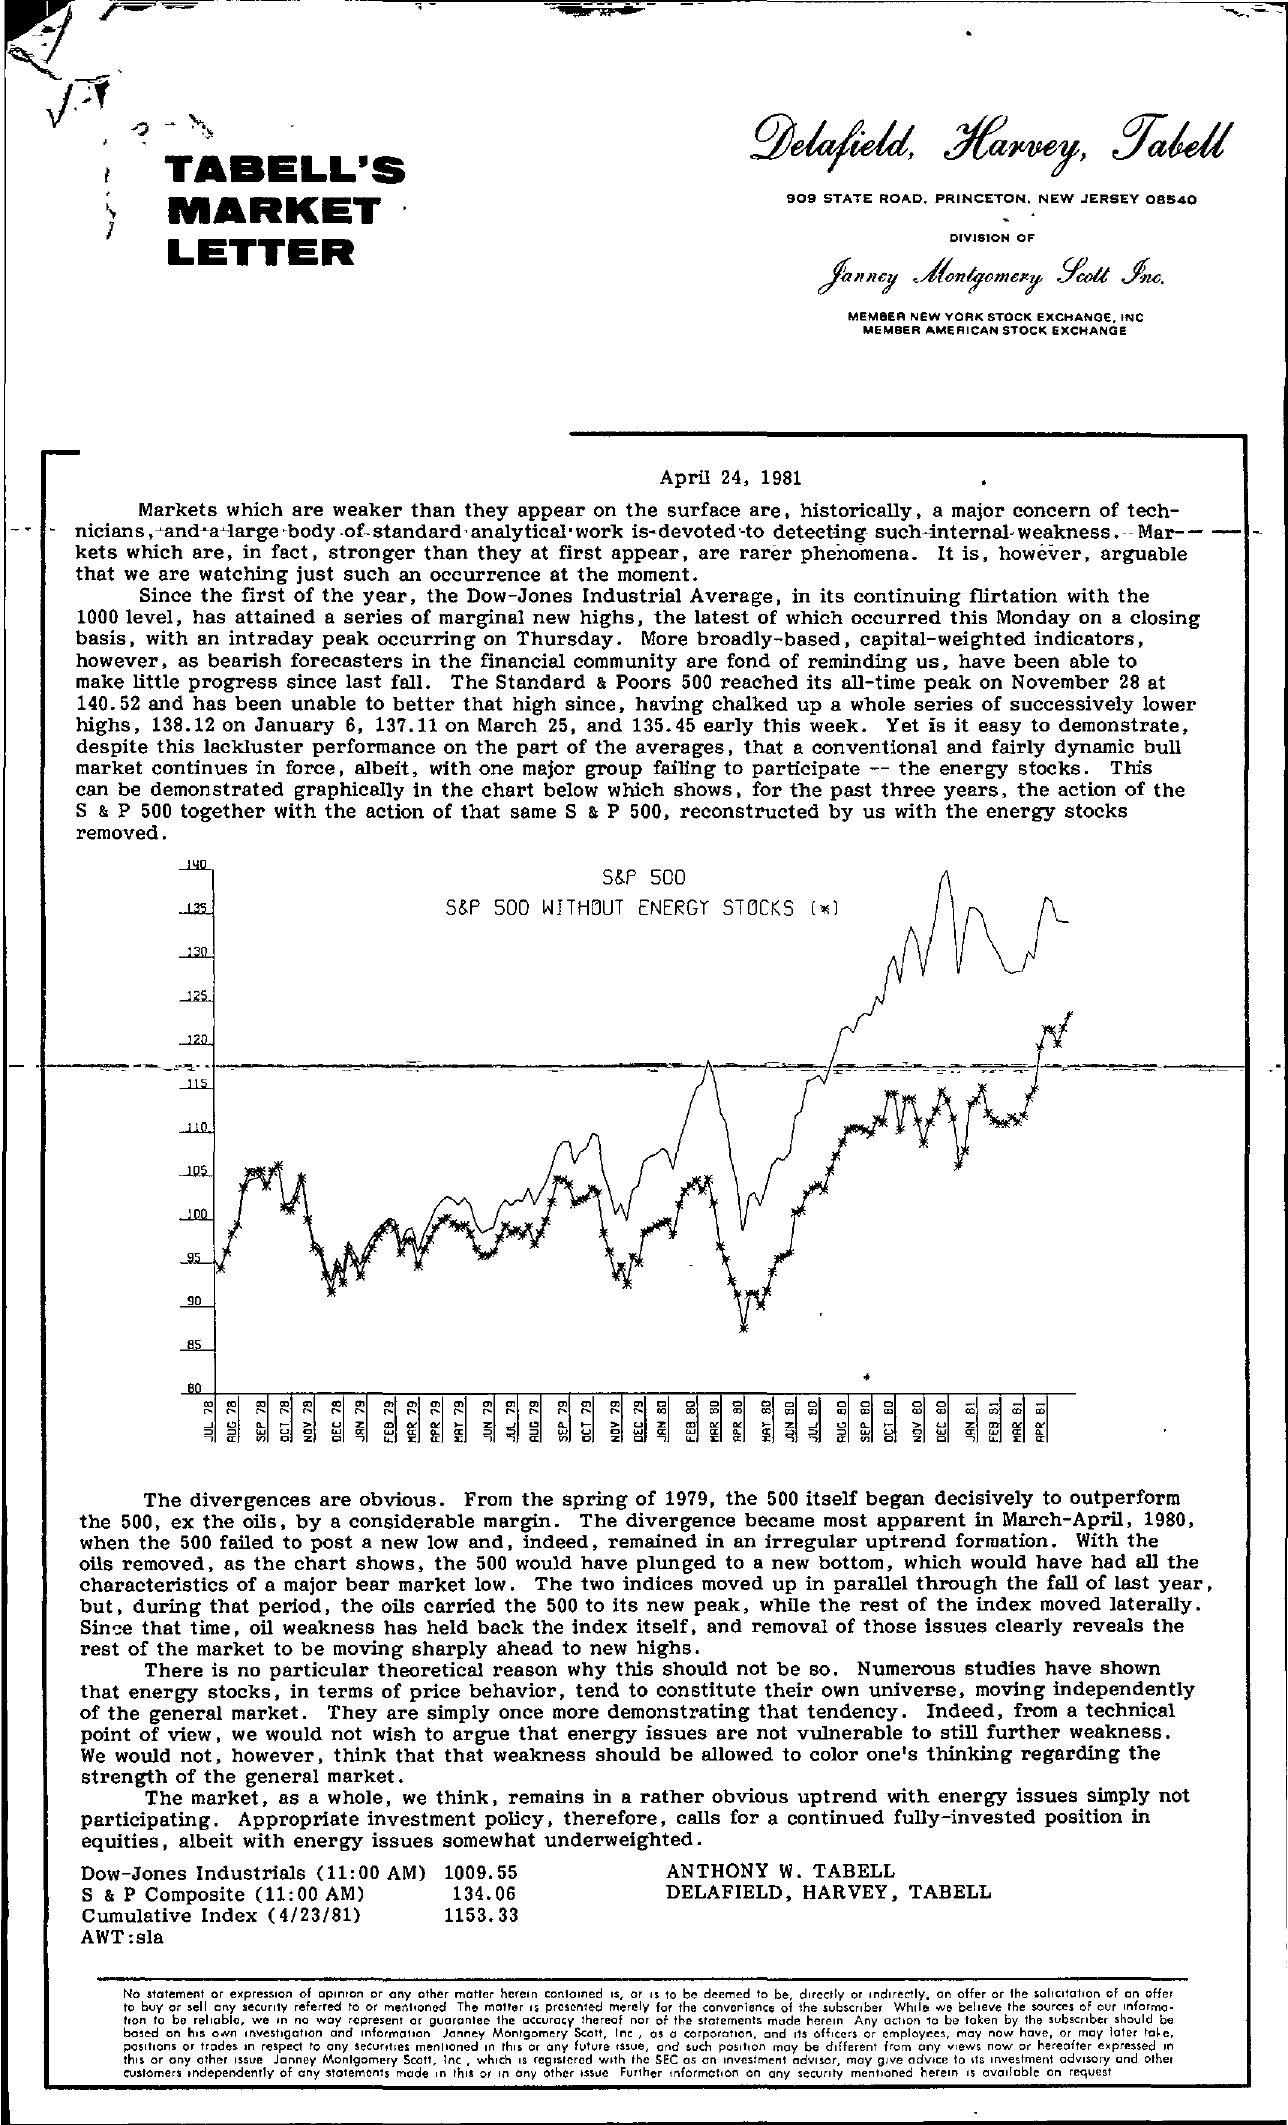 Tabell's Market Letter - April 24, 1981